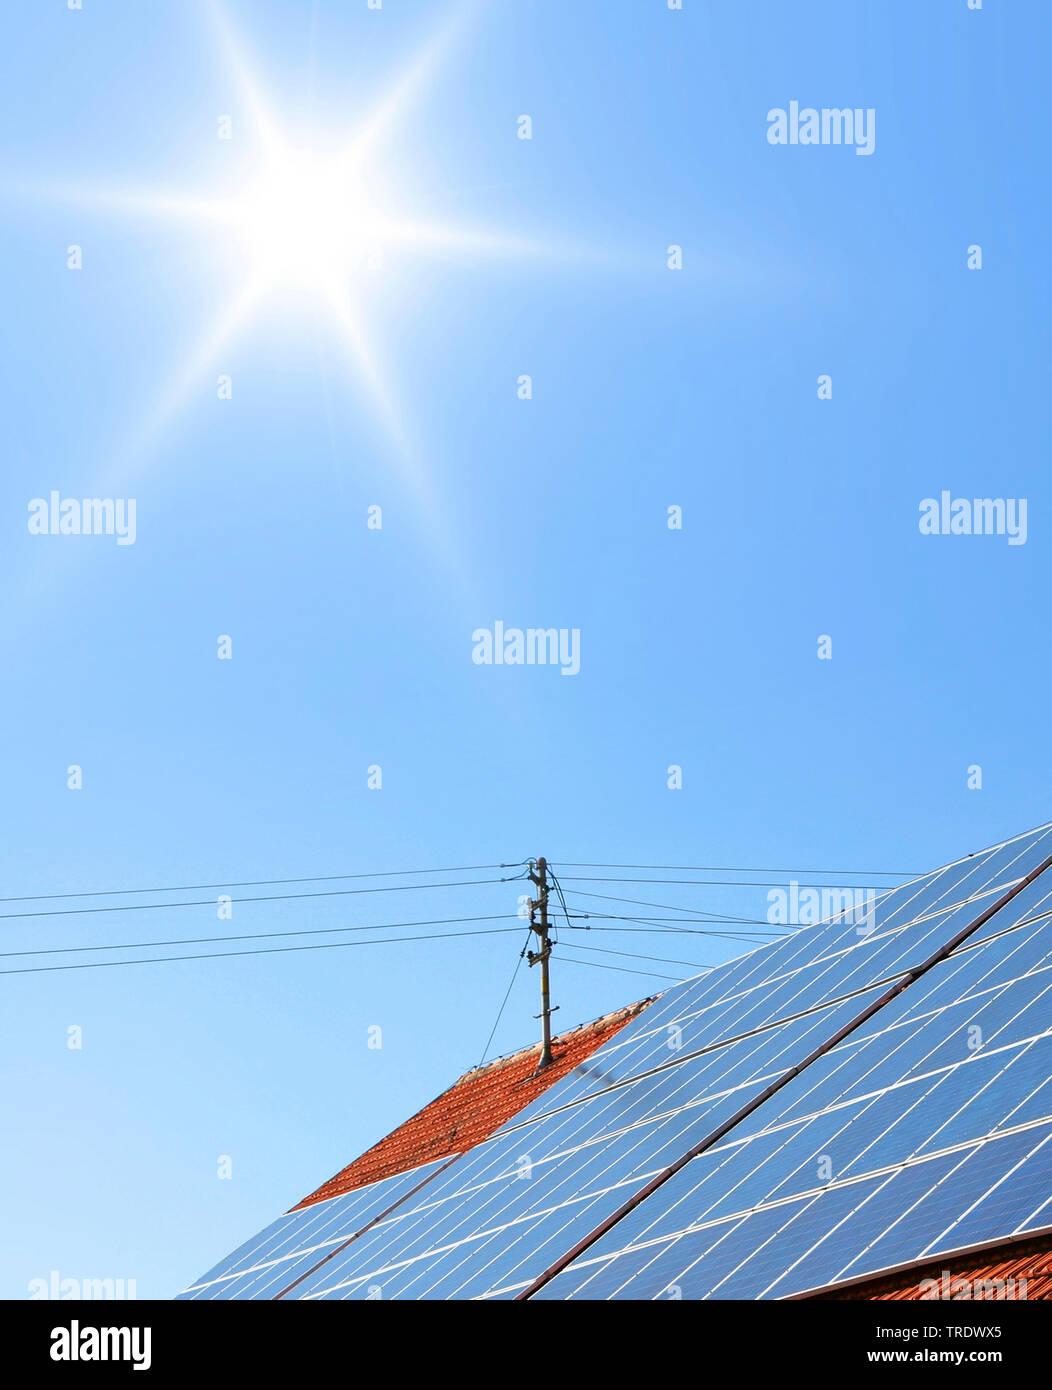 Detailaufnahme eines Hausdachs mit Solarzellen vor wolkenlosem Himmel | Detail of residental house roof with solar panels against cloudless sky | BLWS - Stock Image